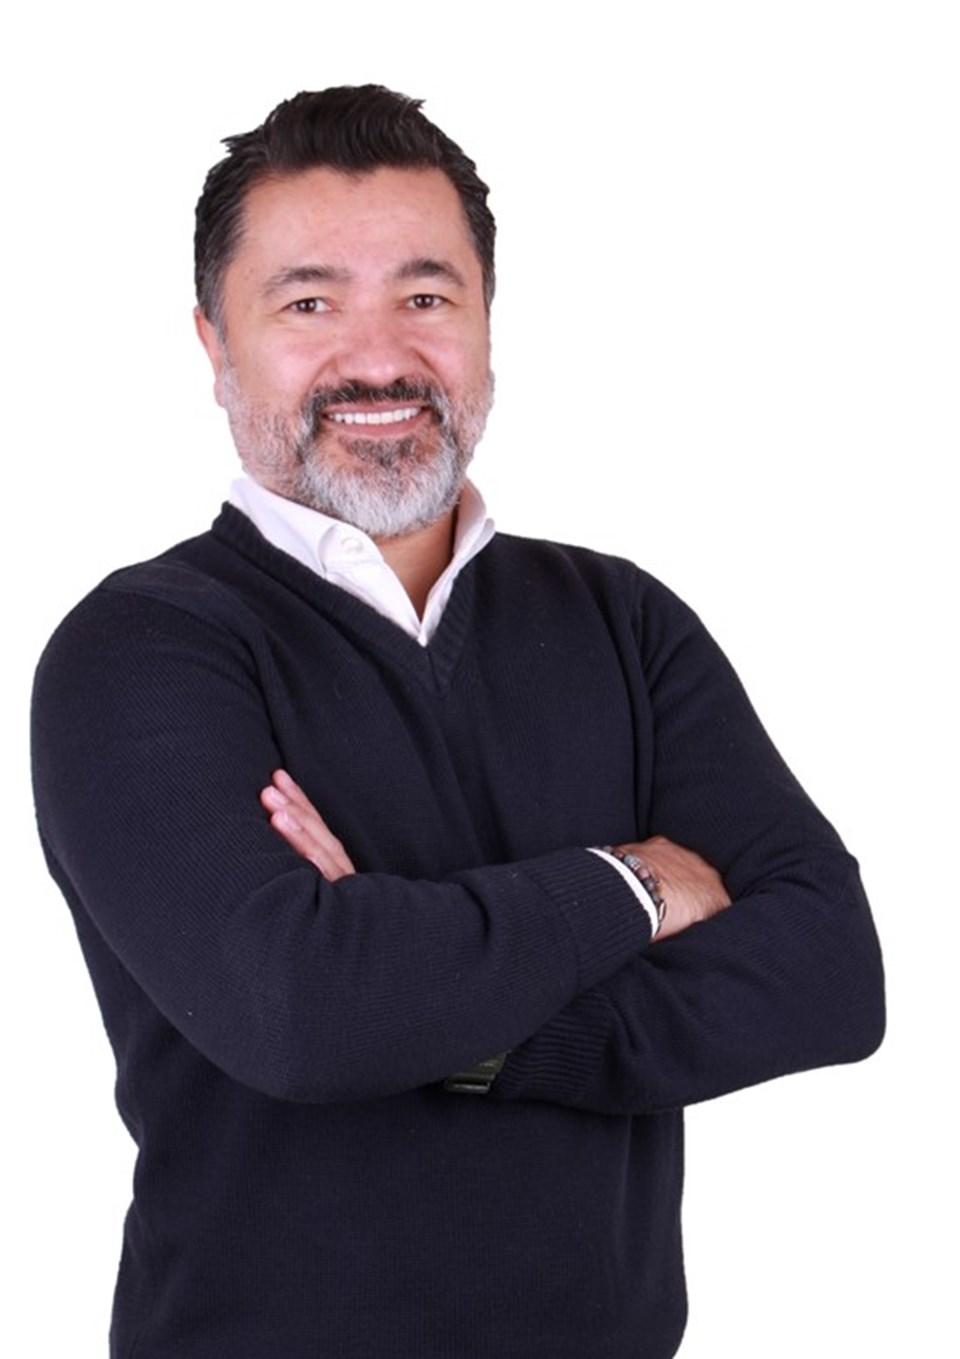 Ortodonti Uzmanı Dr. Cihan Çapan